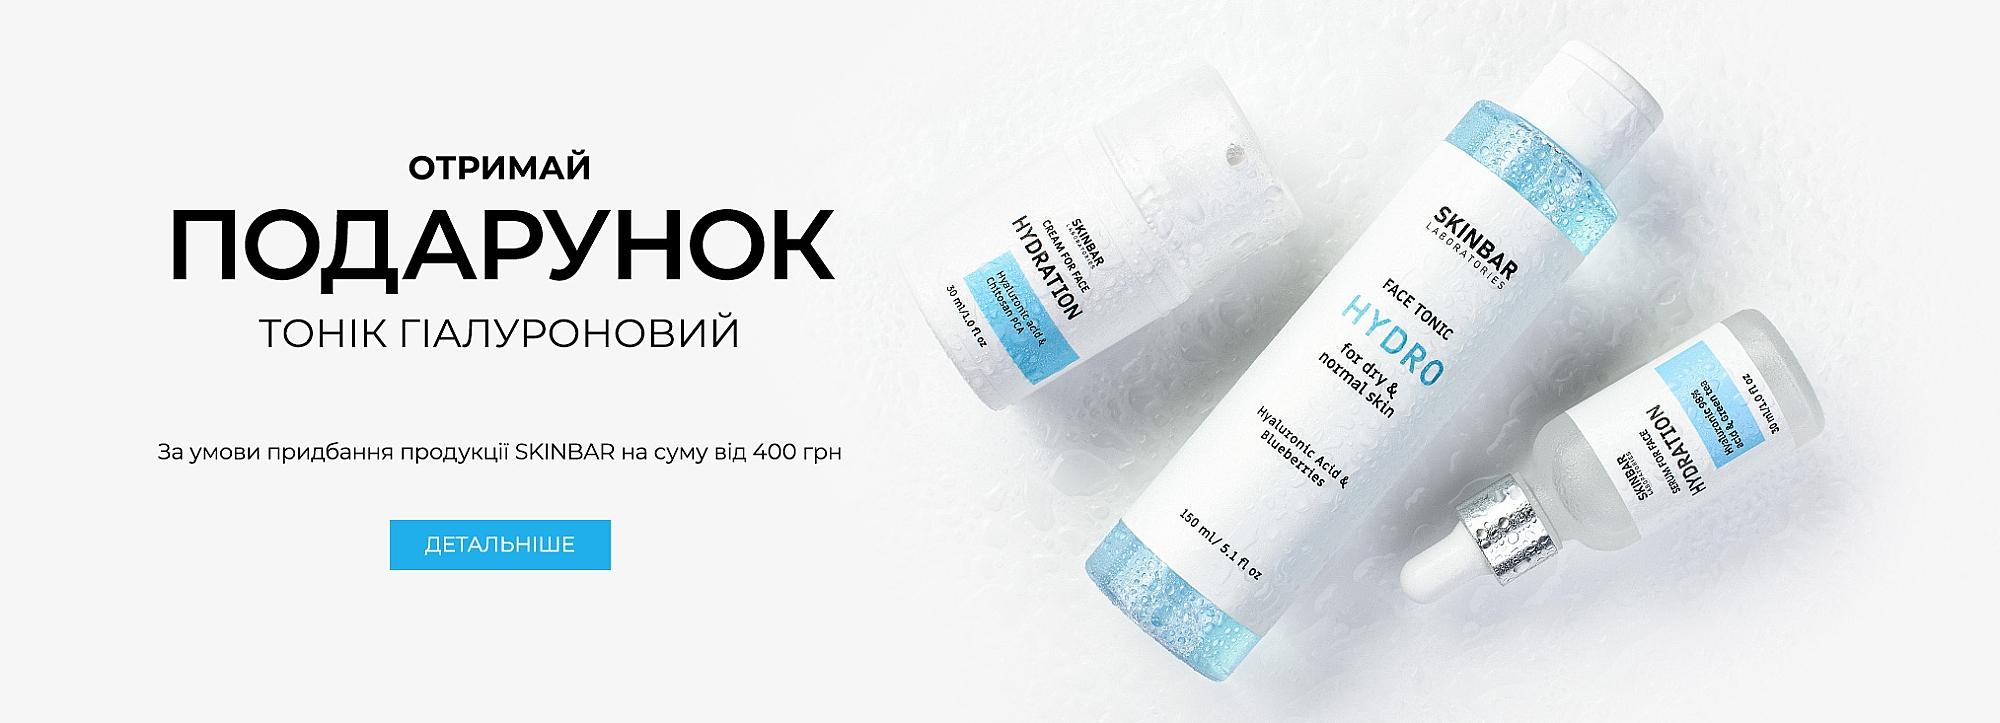 Skinbar tonic